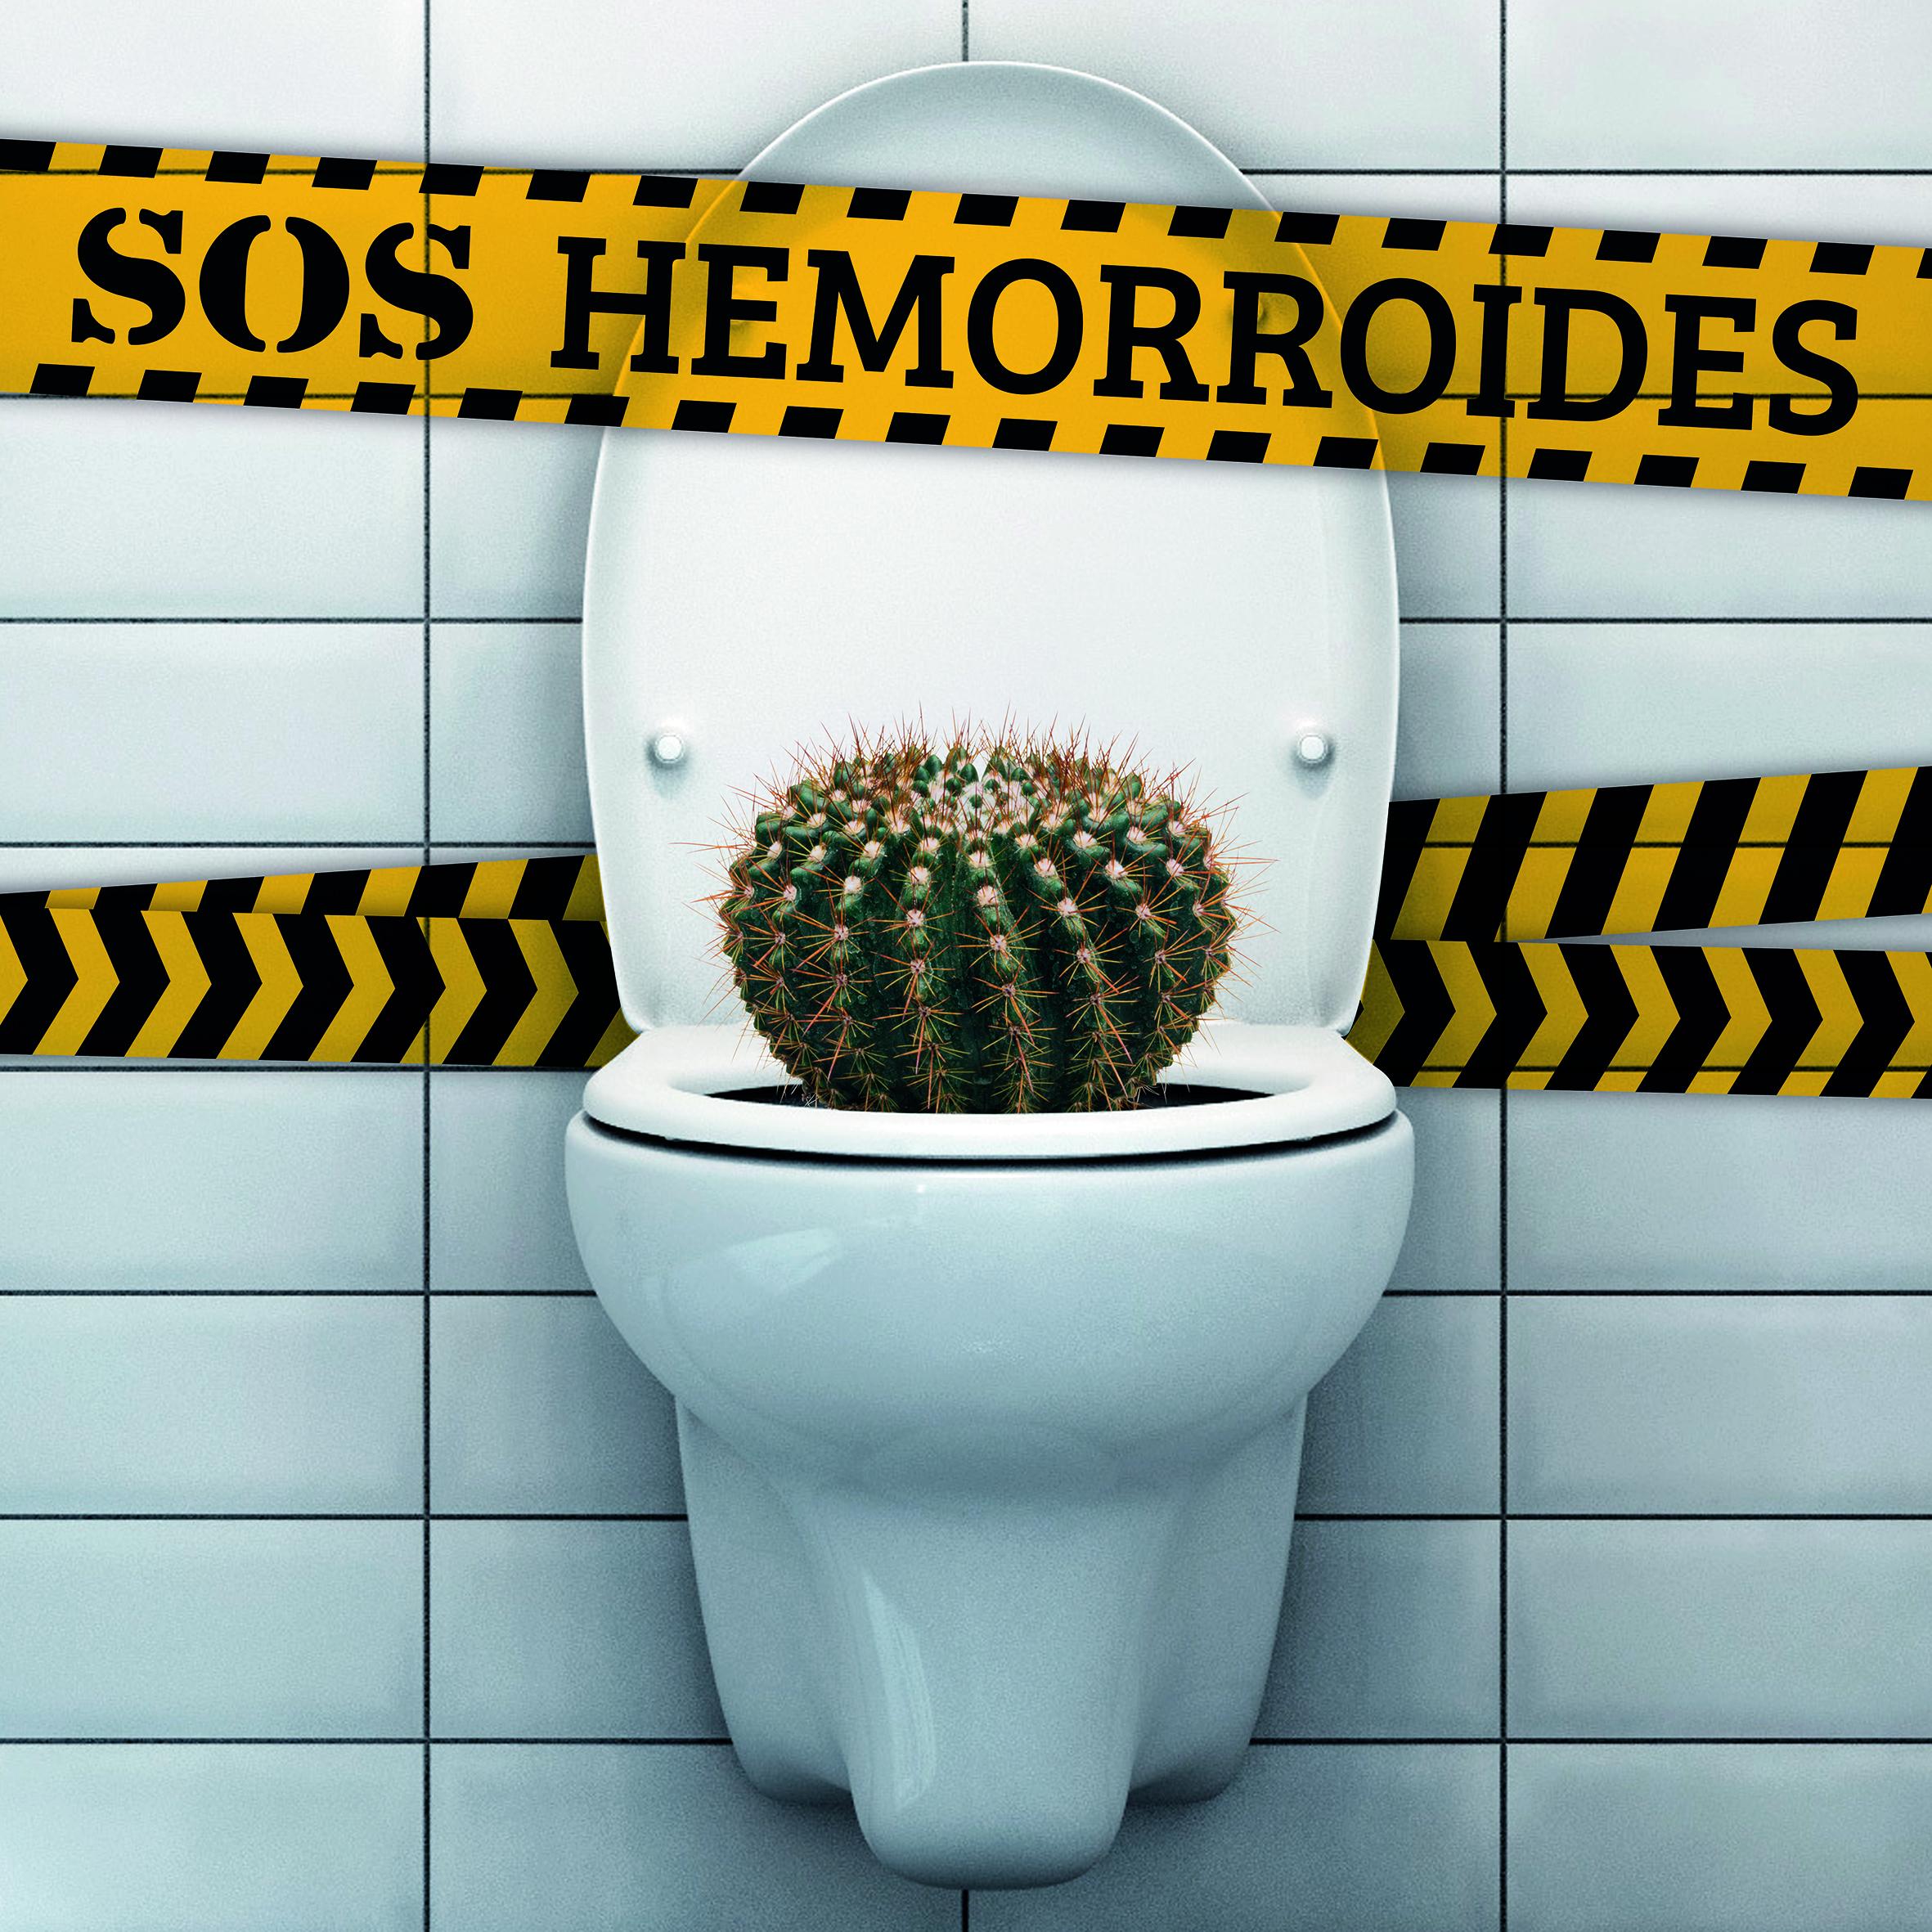 SOS HEMORROIDES!!!